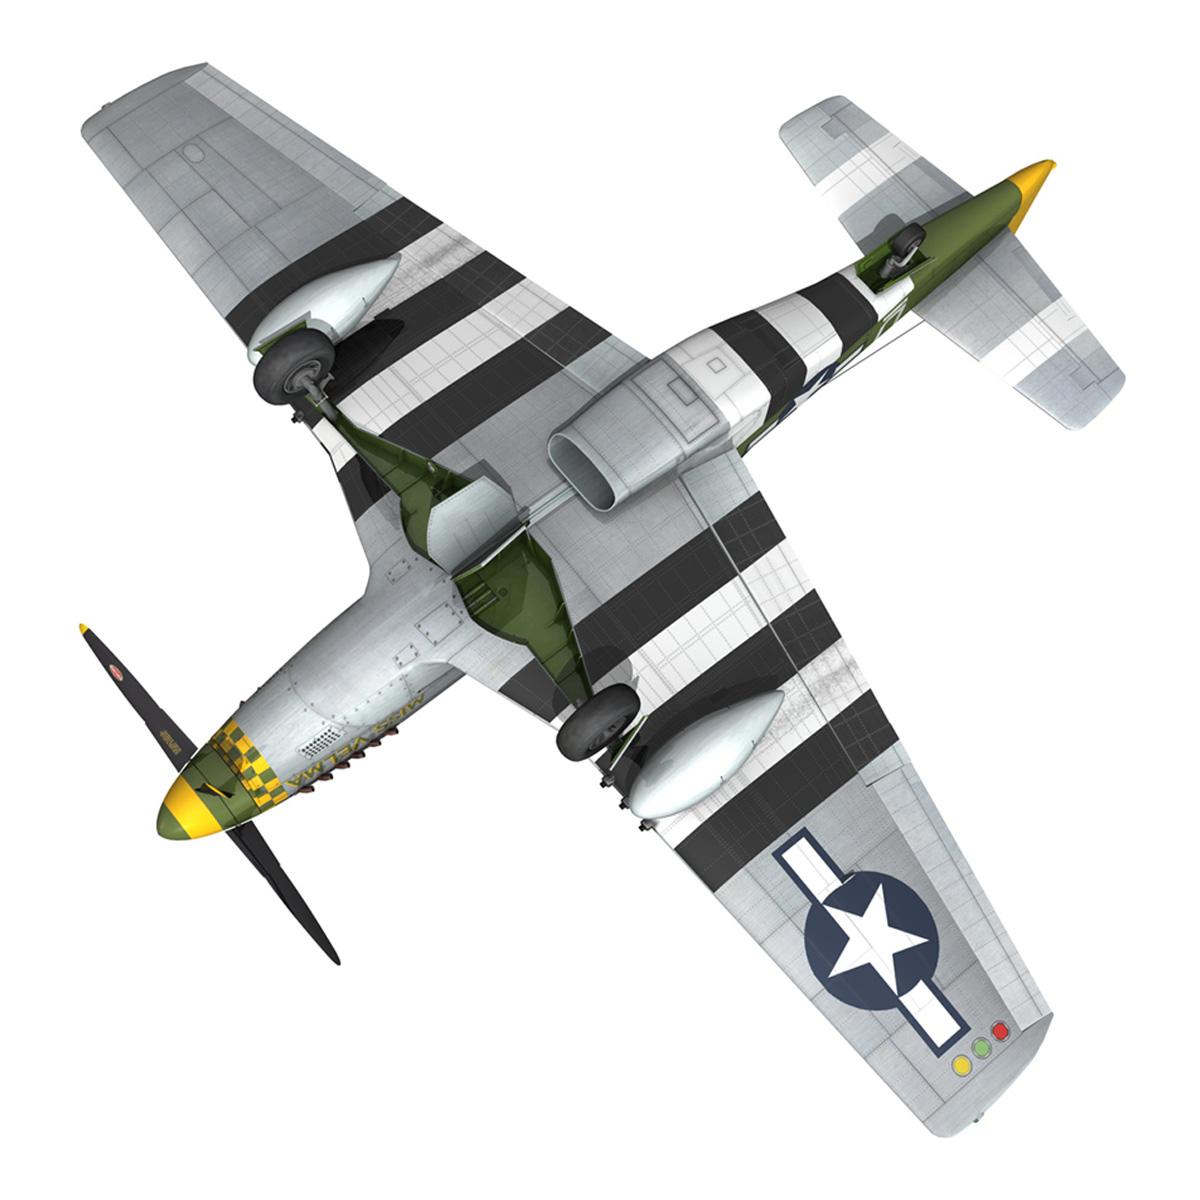 north american p-51d – mustang – miss velma 3d model 3ds fbx c4d lwo obj 267634